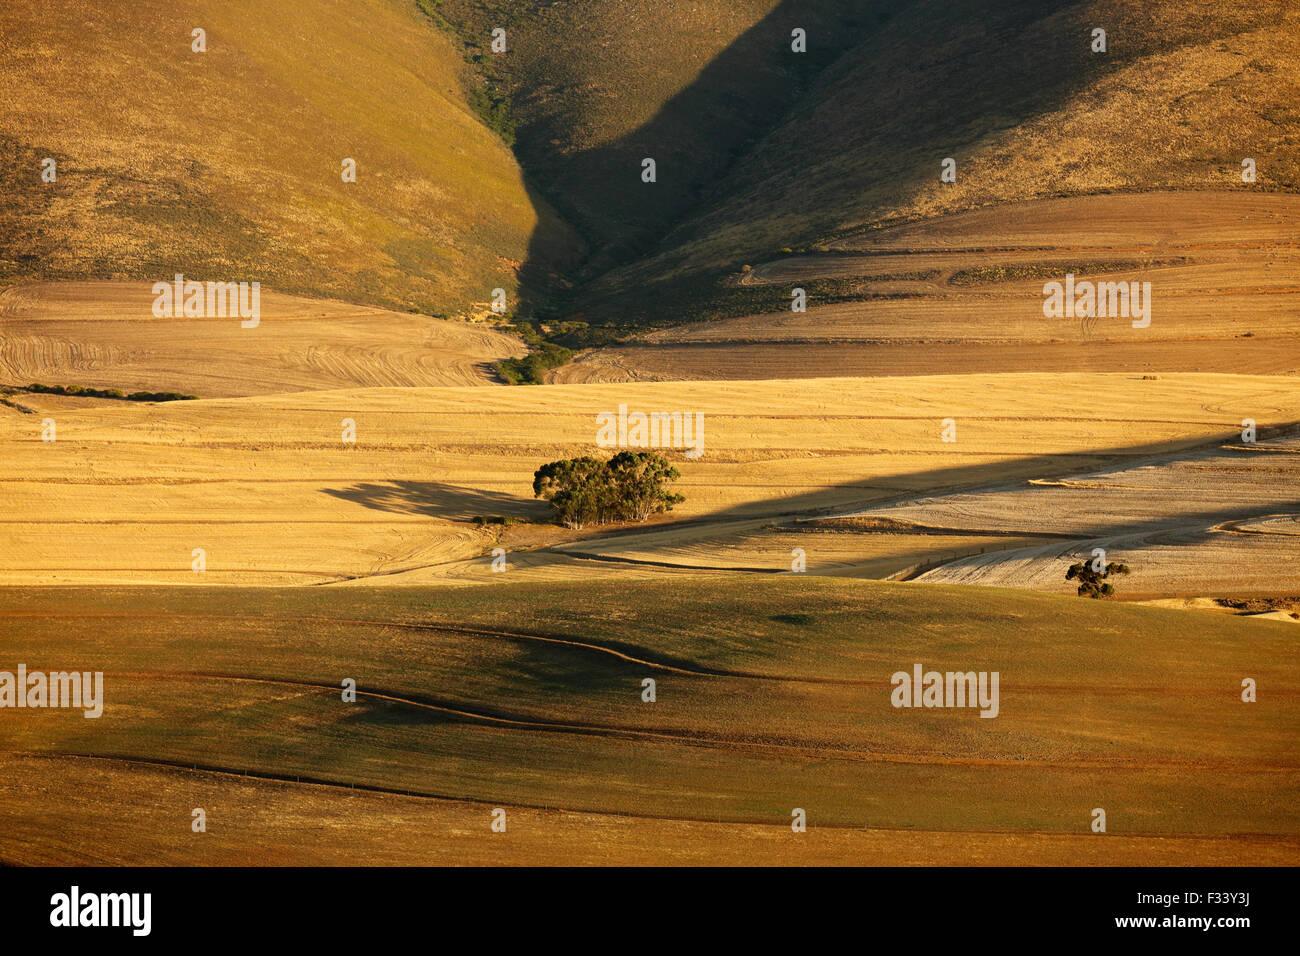 rolling farmland in the Overberg region near Villiersdorp, Western Cap, South Africa - Stock Image